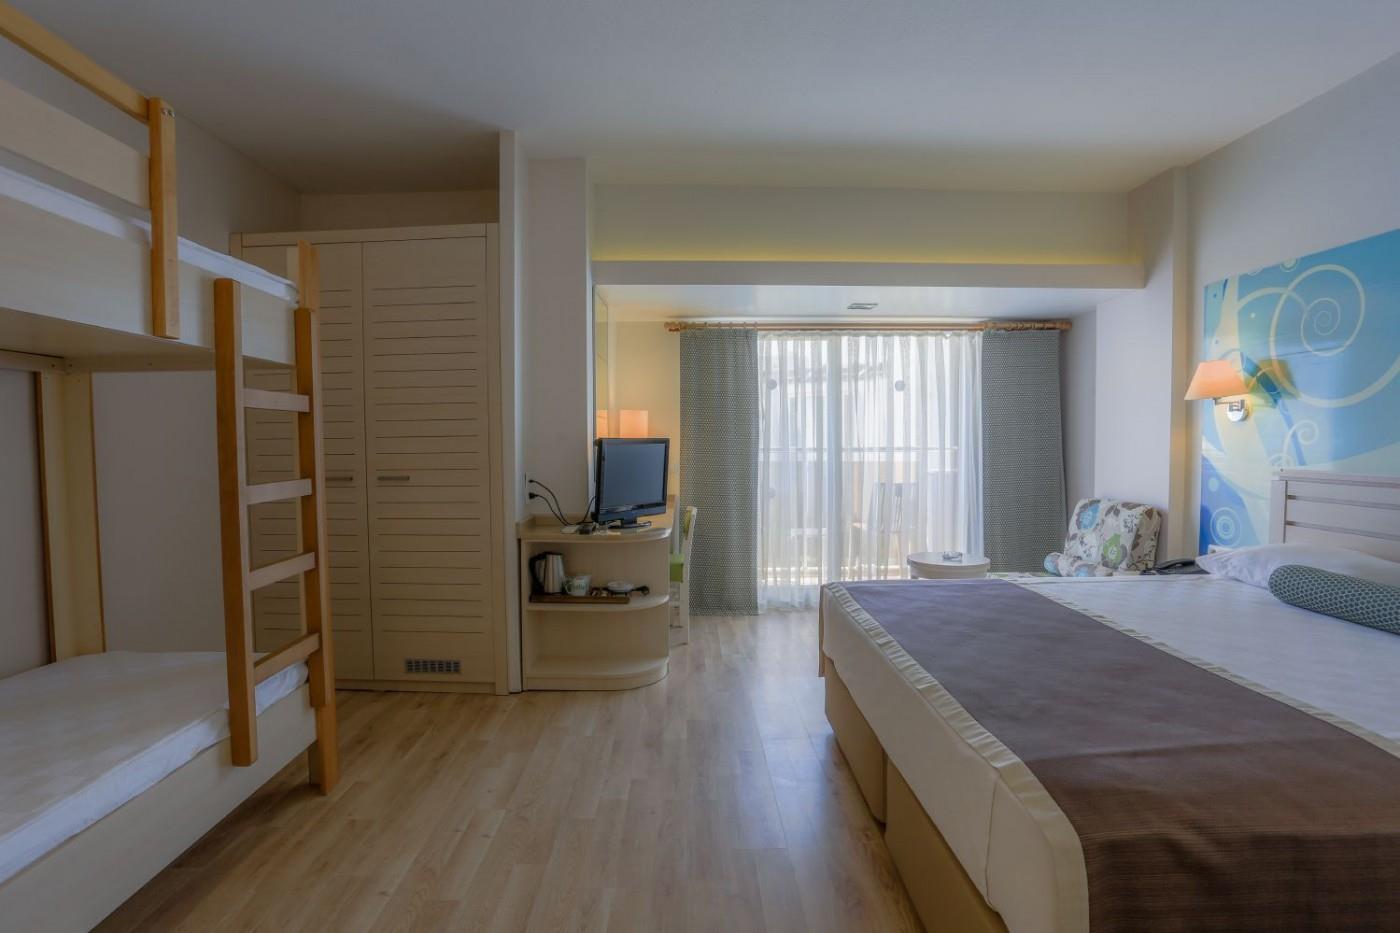 http://www.orextravel.sk/OREX/hotelphotos/thalia-unique-area-0018.jpg